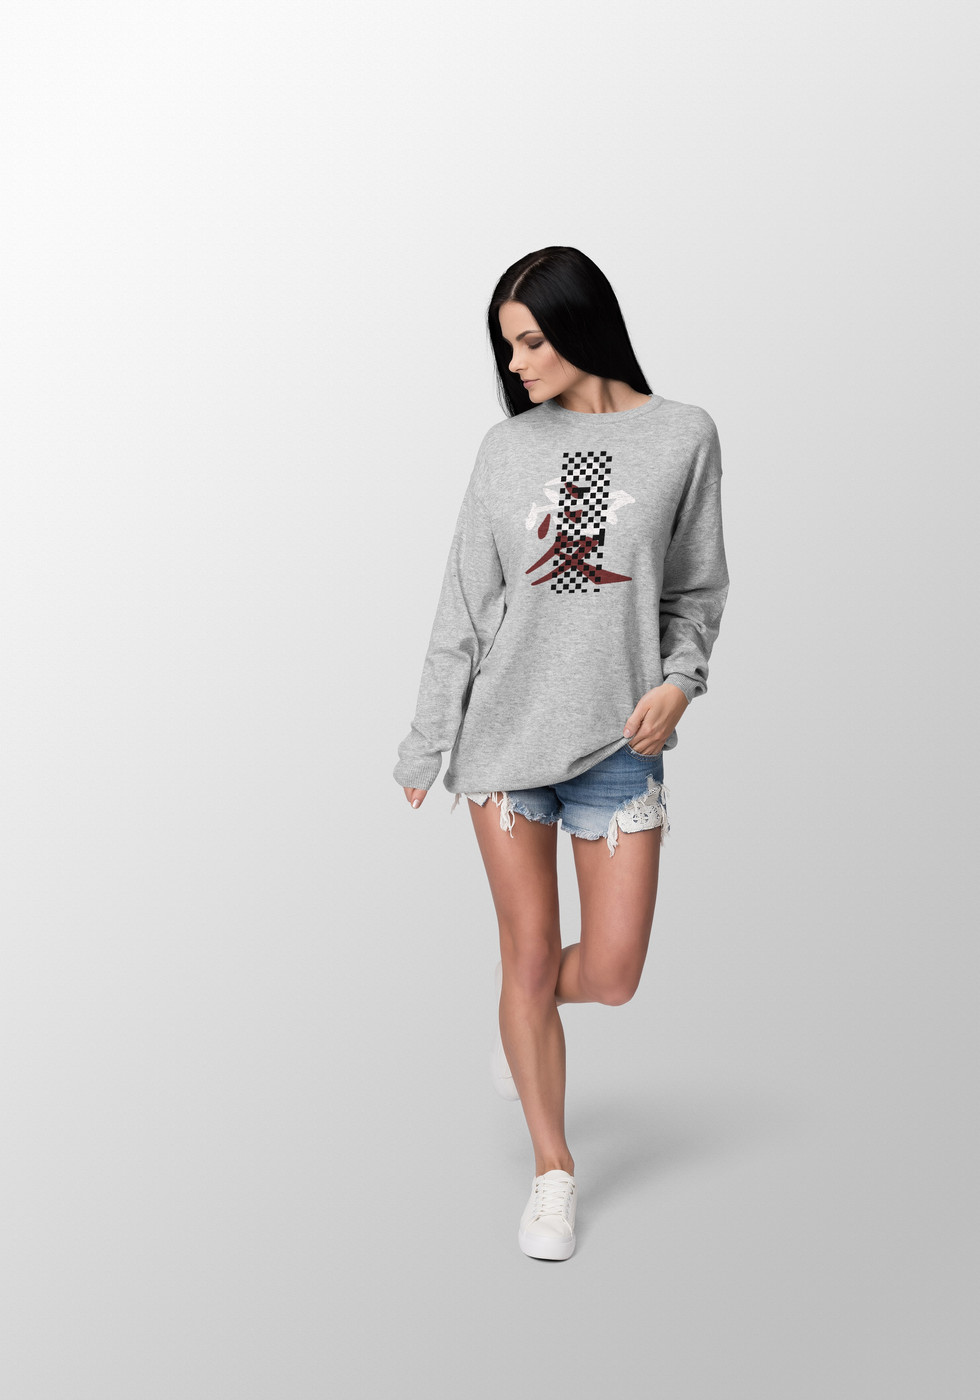 04-pullover-female-model-mockup-min.jpg